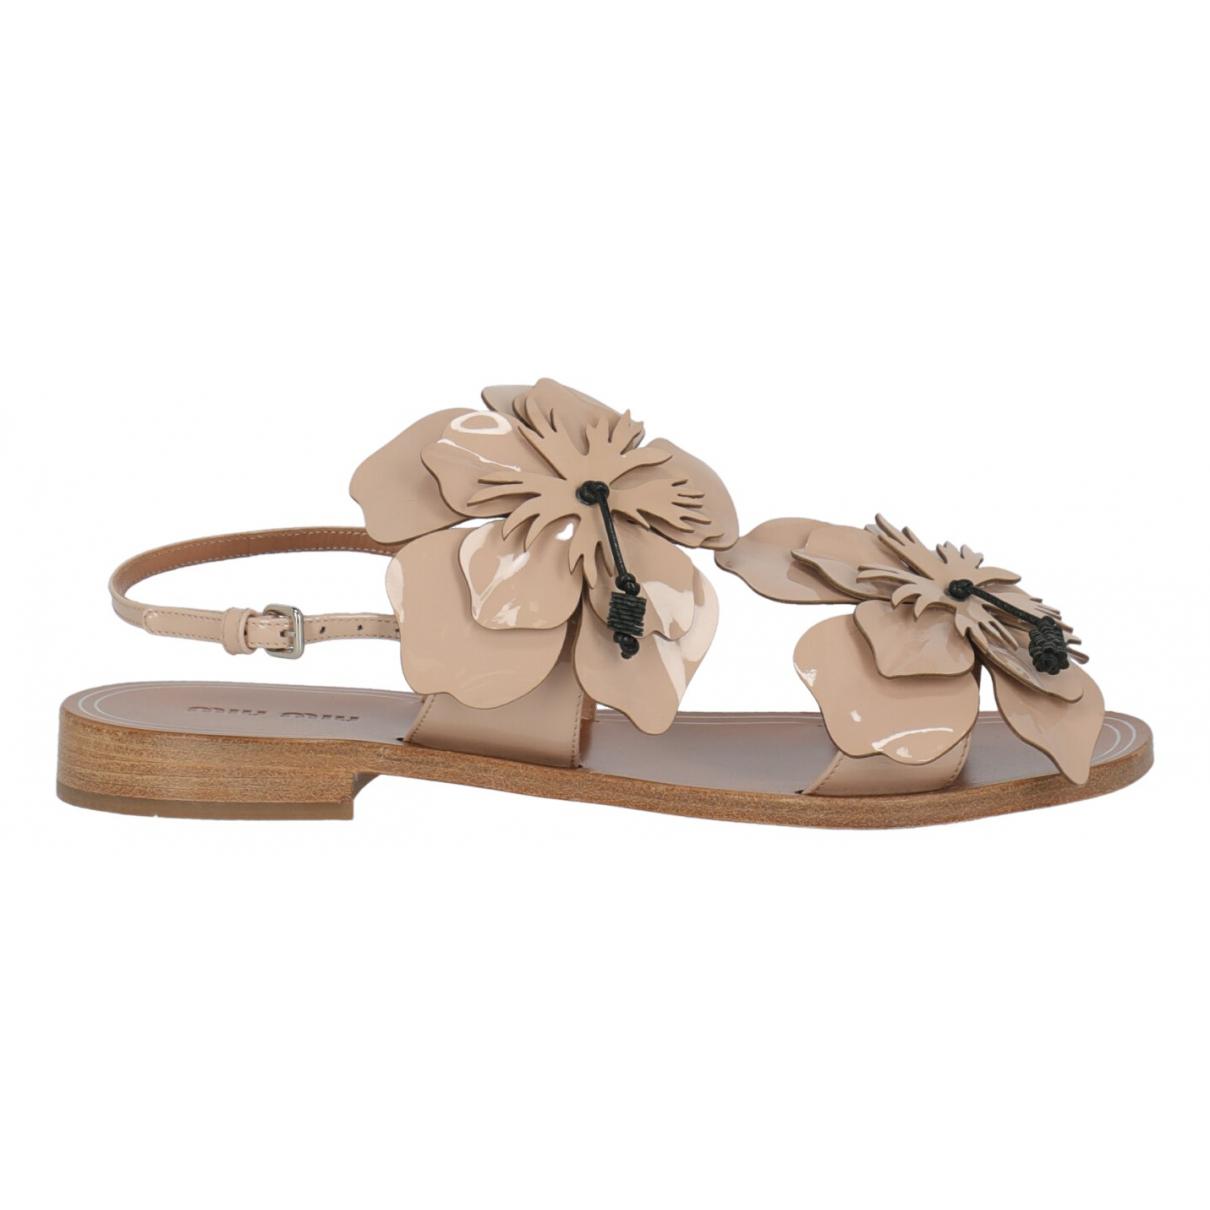 Miu Miu N Pink Patent leather Sandals for Women 37.5 IT